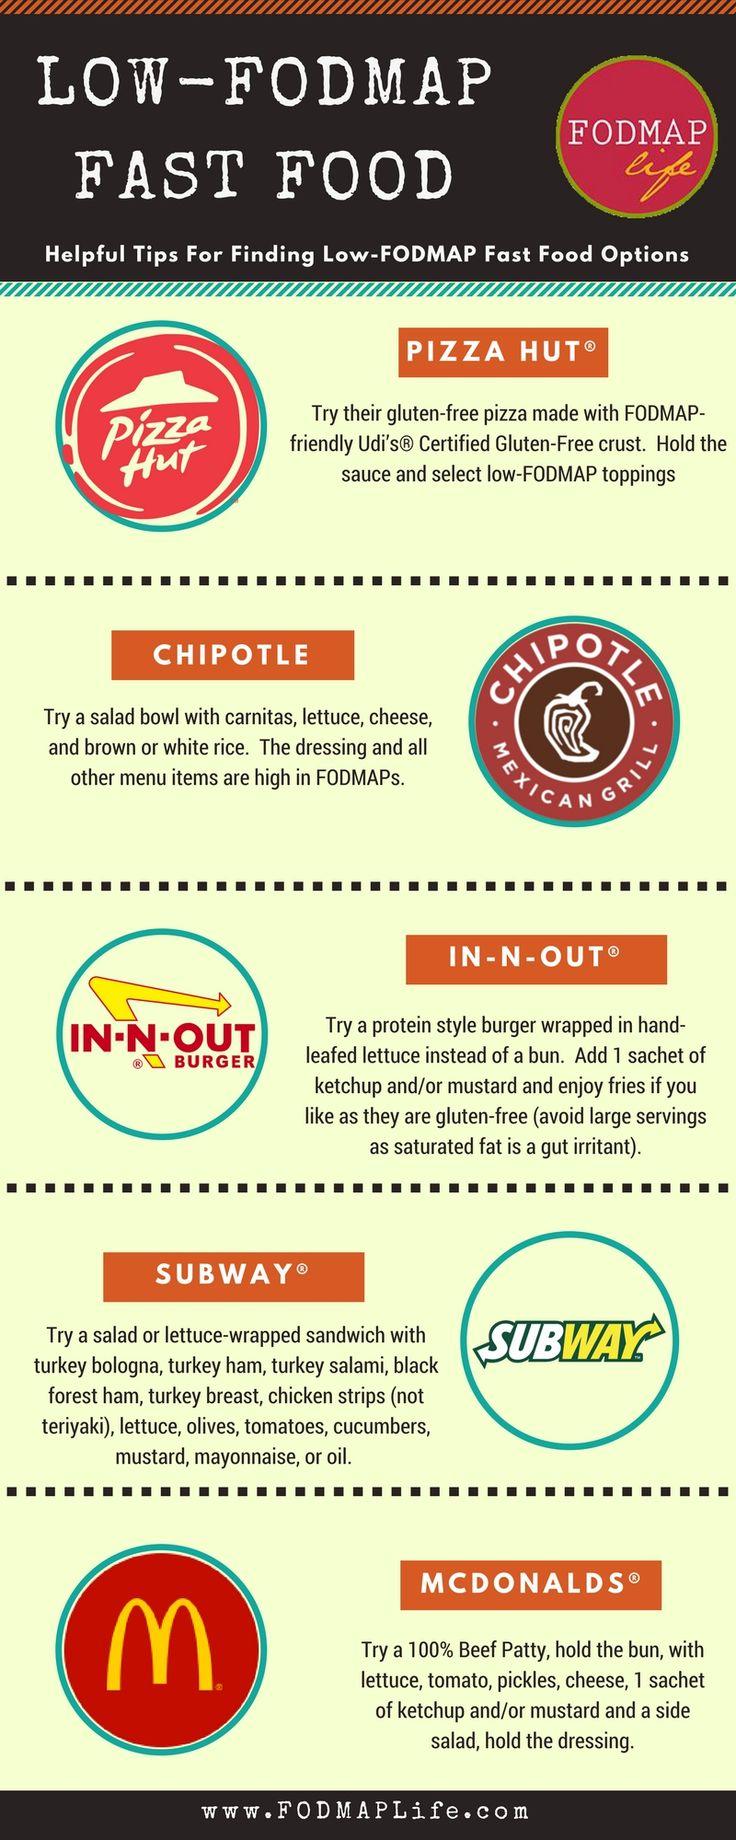 low fodmap fast food options